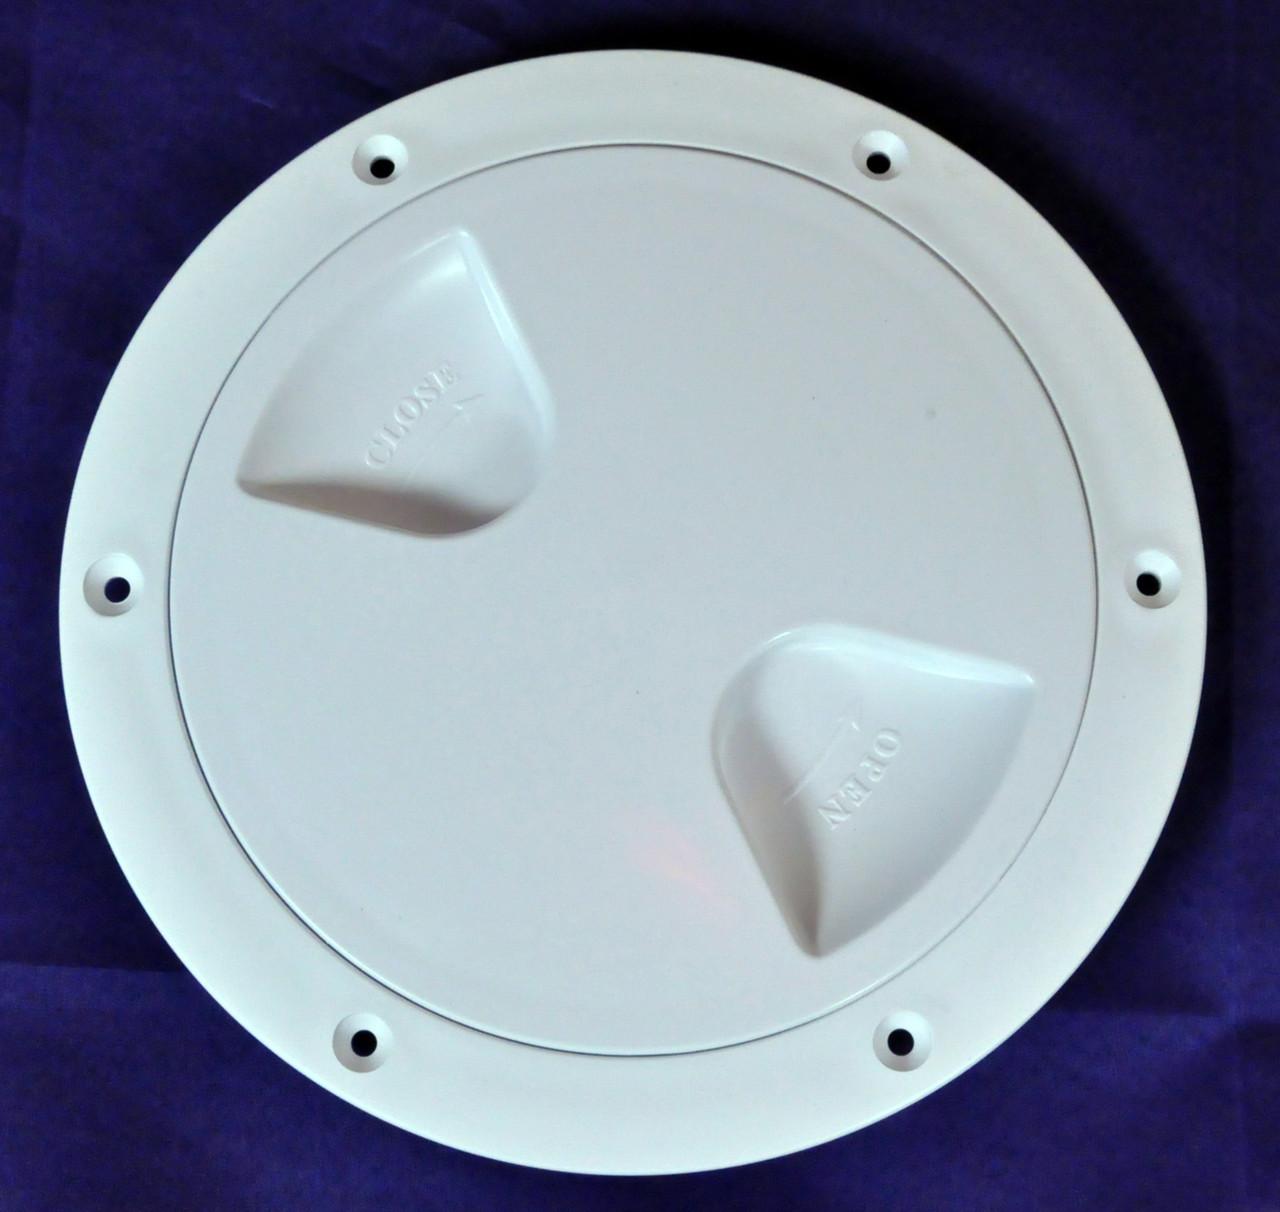 Лючок инспекция диаметр 127 мм белый, Тайвань 13561-WH